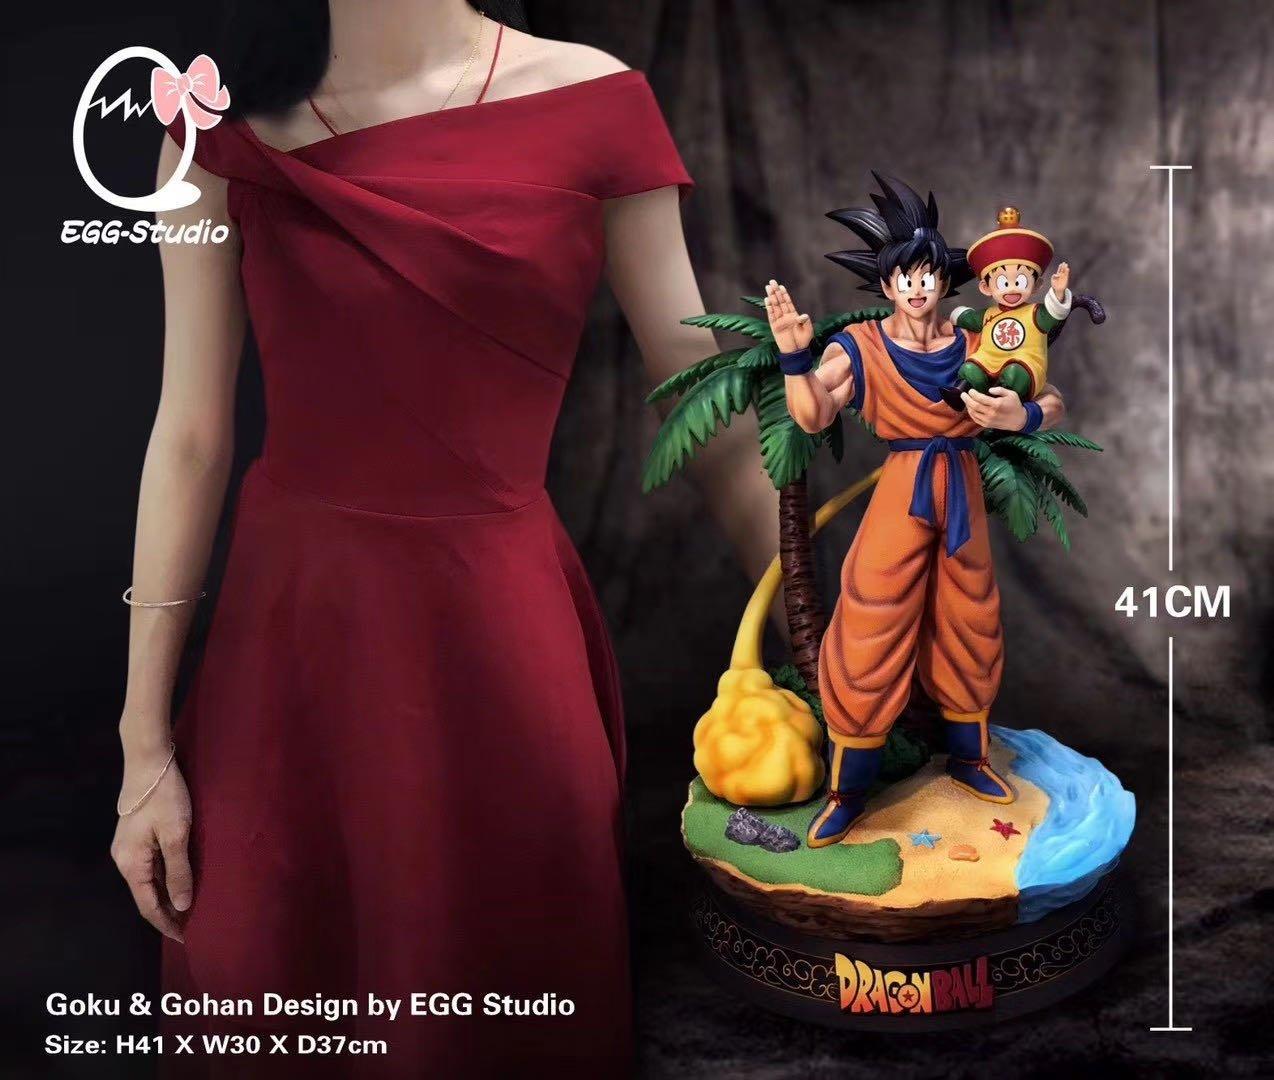 Image of [Pre-Order]Dragon Ball Z Egg Studio Goku Resin Statue